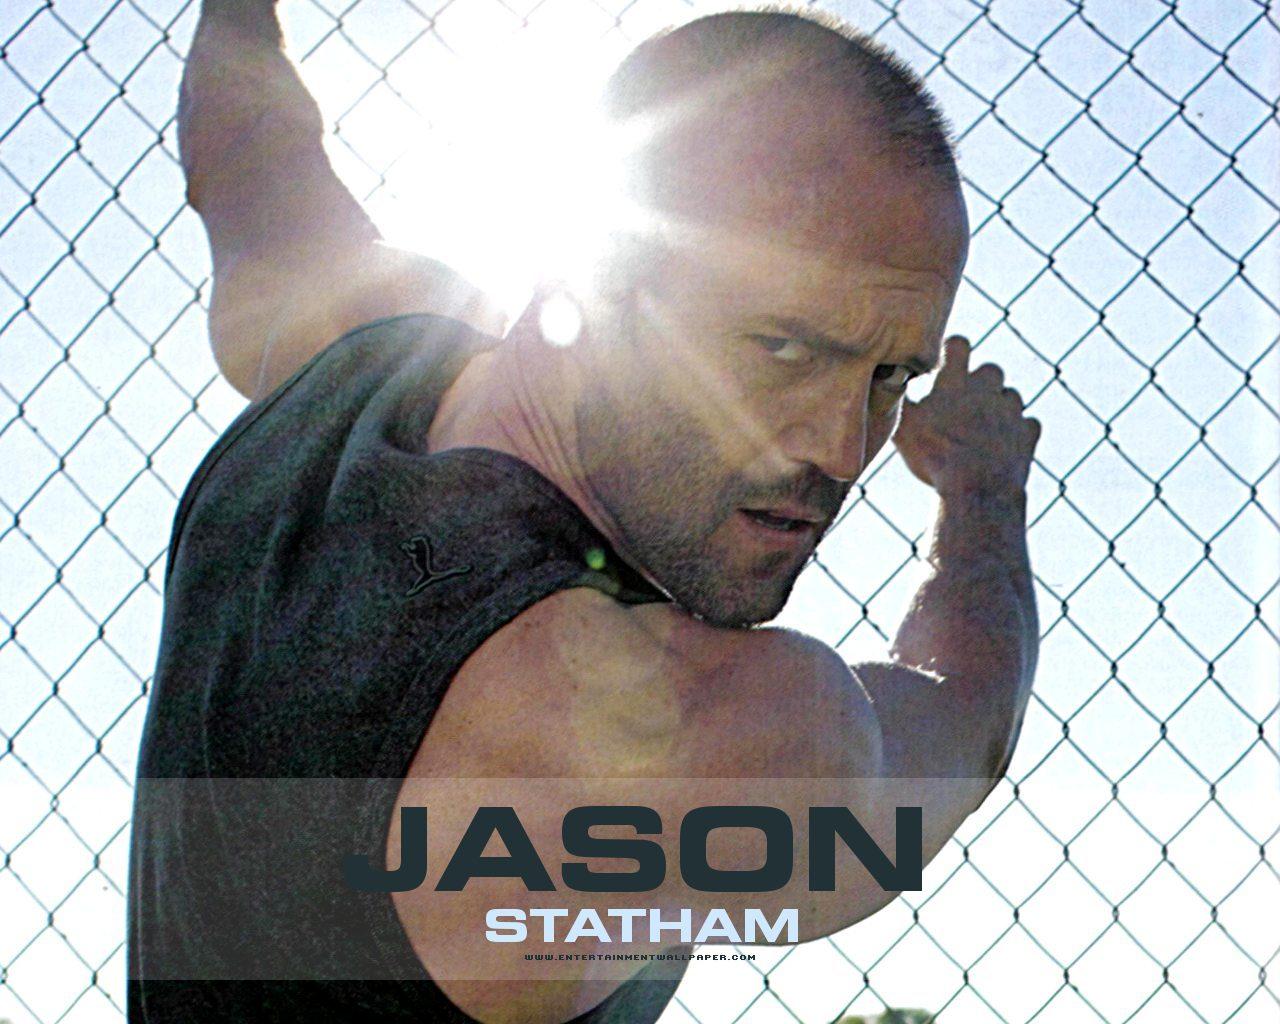 http://4.bp.blogspot.com/-d_0ChjQMNhc/T7S2HOYOrqI/AAAAAAAAA8g/hhGJvDsXfPI/s1600/Jason-Statham--jason-statham-645187_1280_1024.jpg